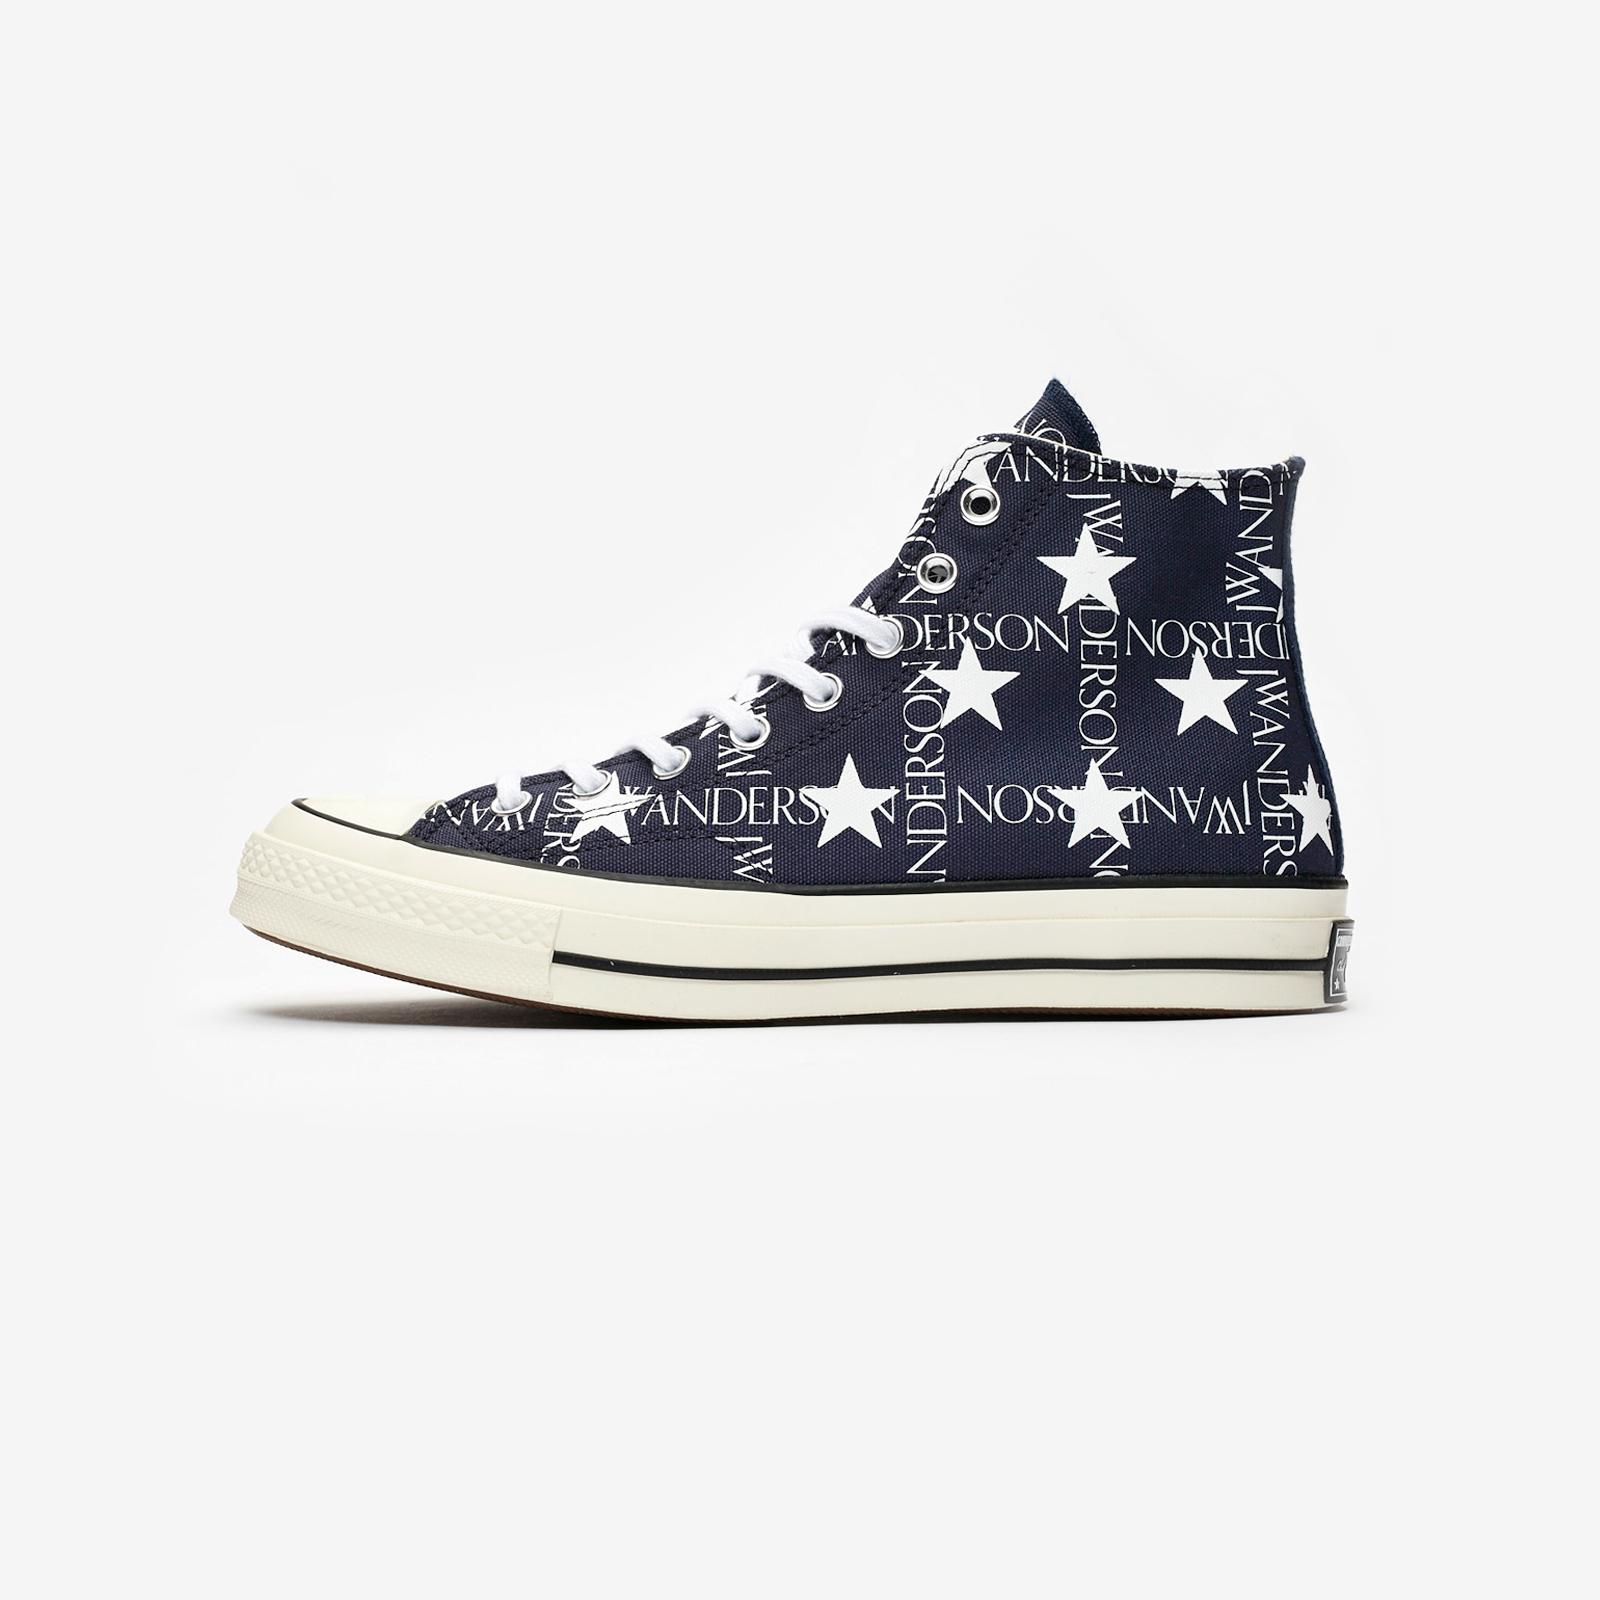 b52743166d7 Converse Chuck 70s Hi x JW Anderson - 164841c - Sneakersnstuff   sneakers &  streetwear på nätet sen 1999